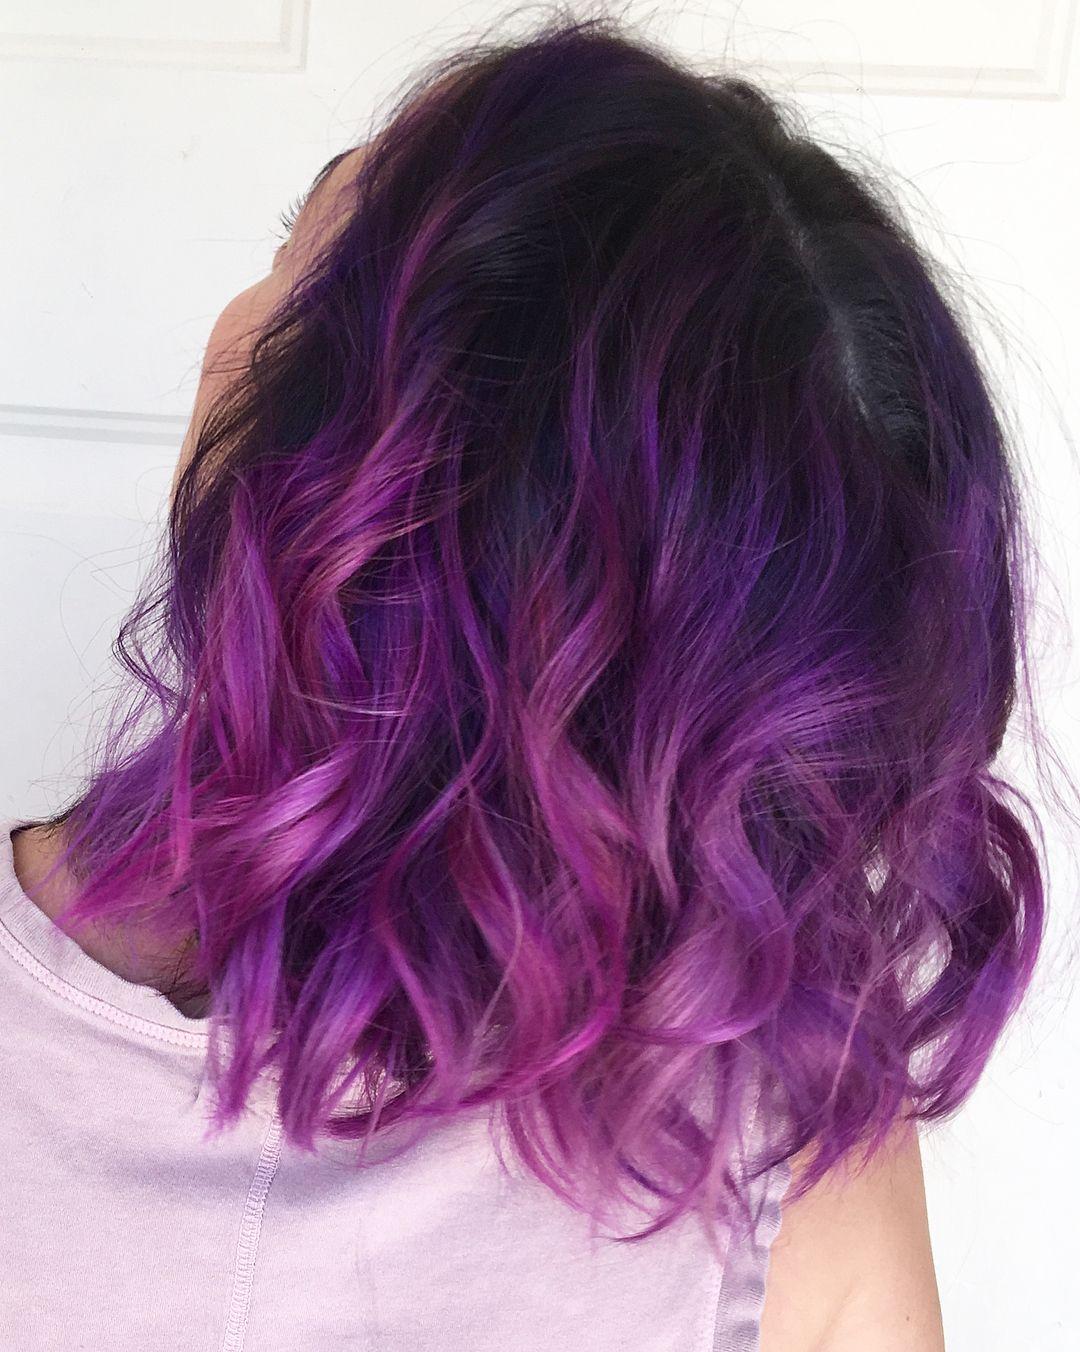 Pulp riot velvet and jam hair color purple ombre hair dye